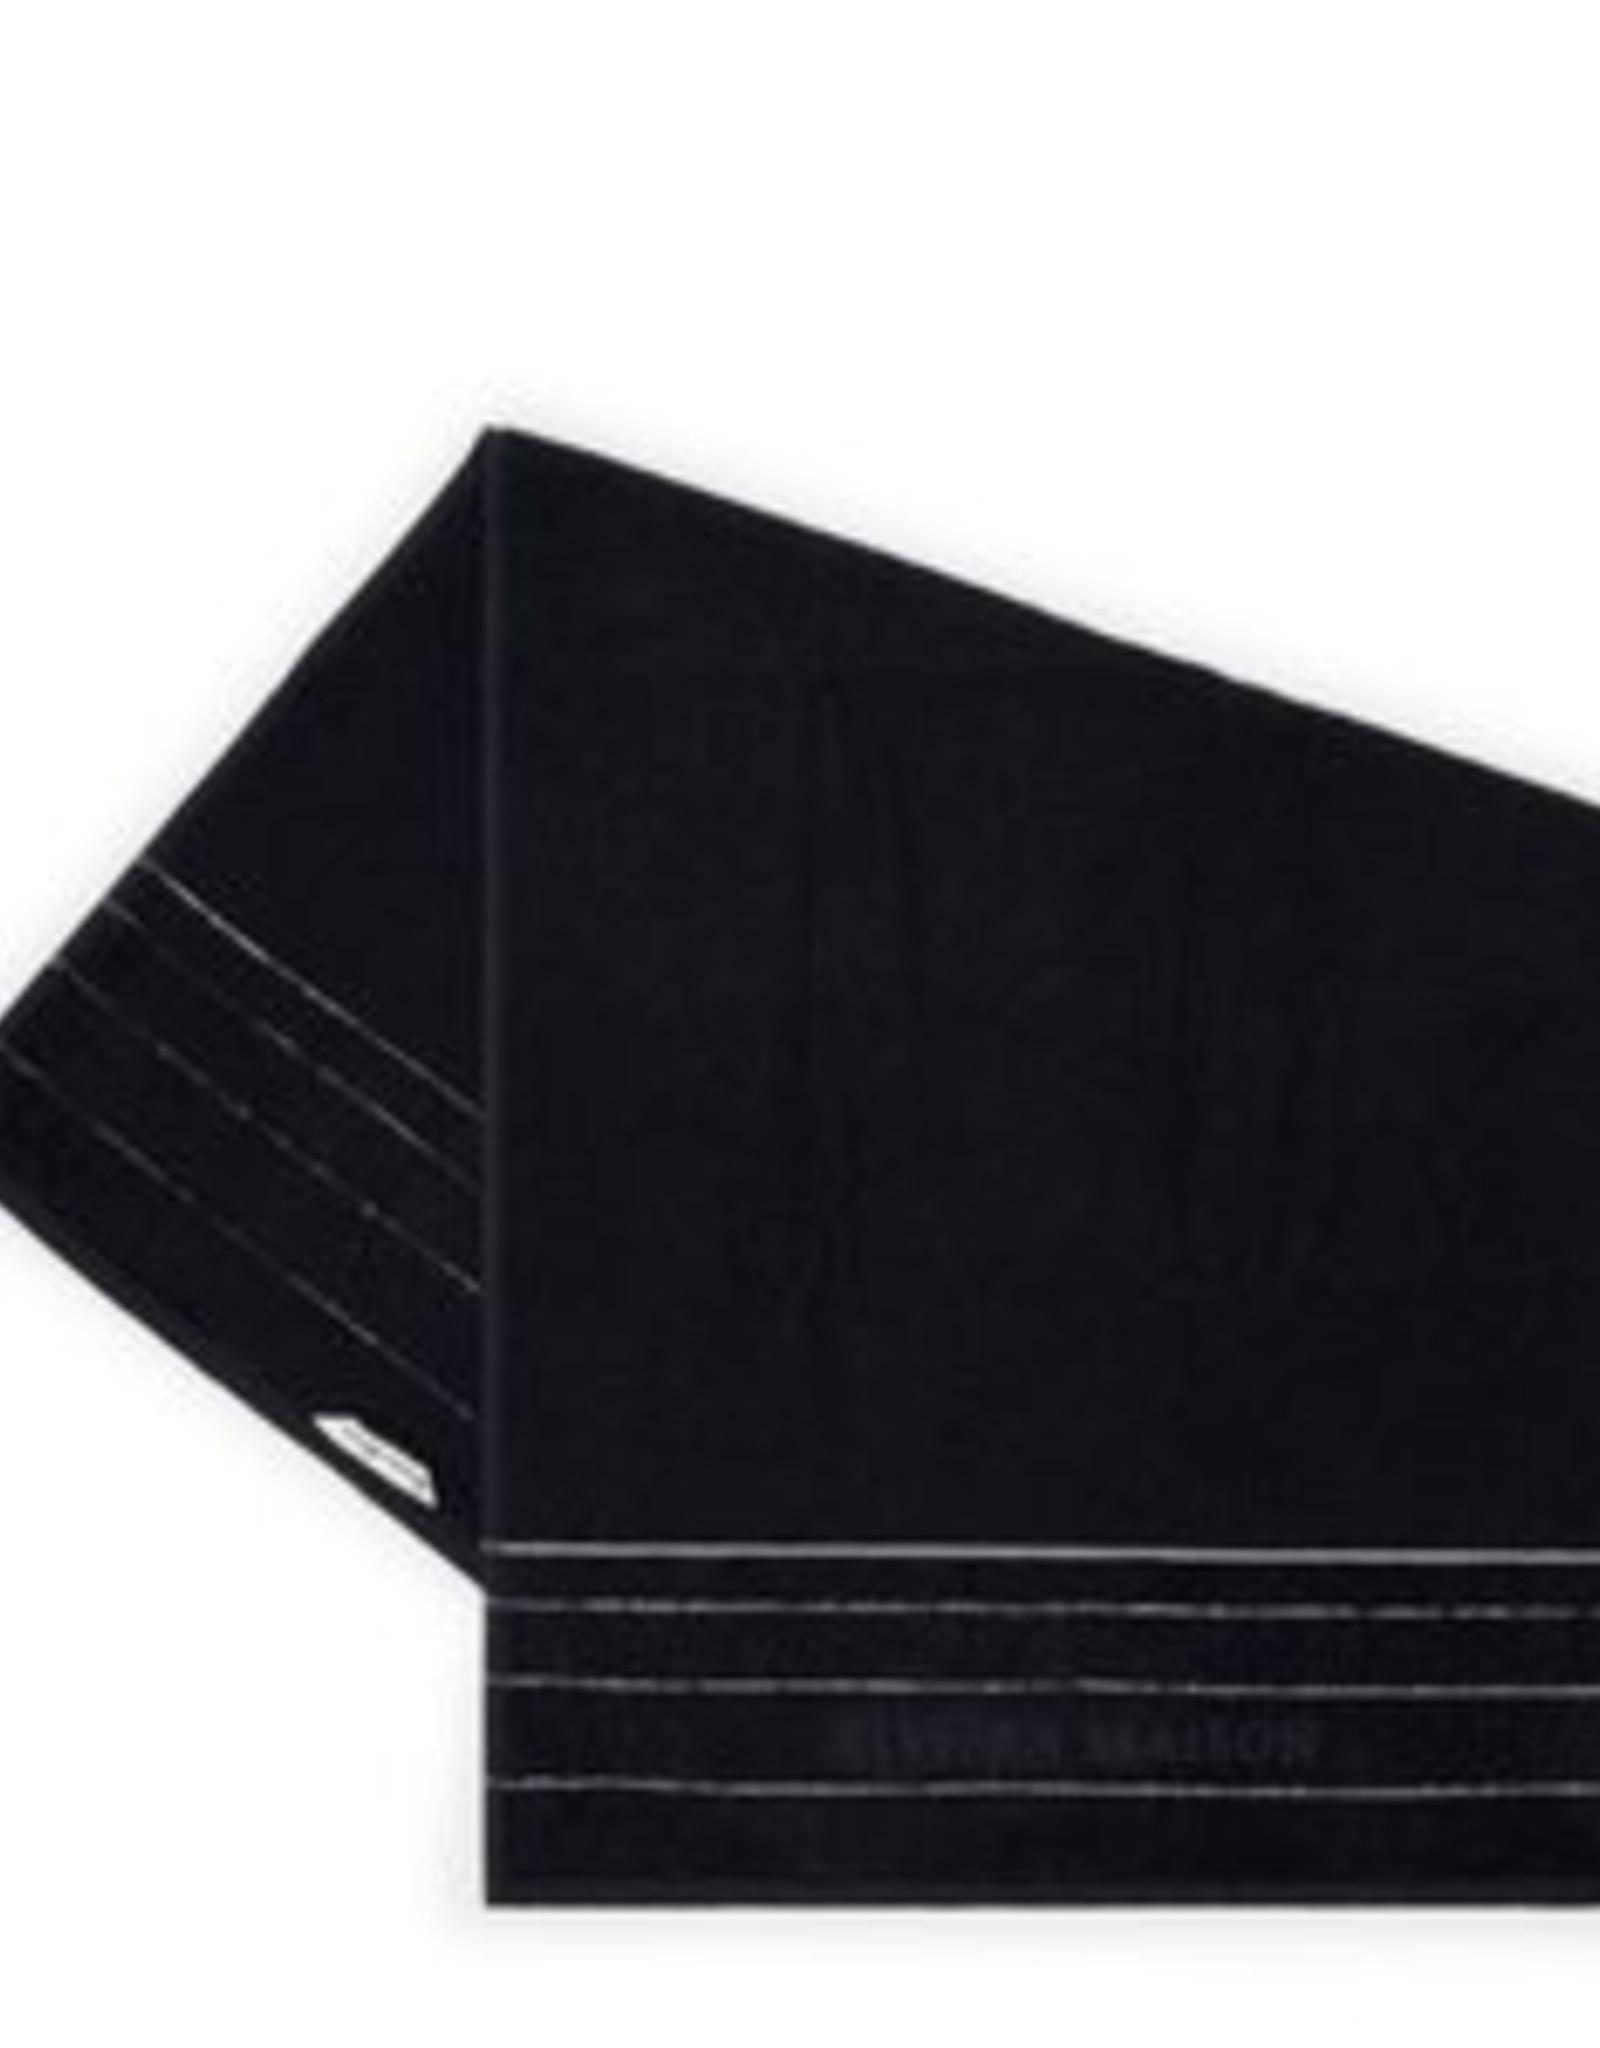 Riviera Maison RM Elegant Towel black 140x70